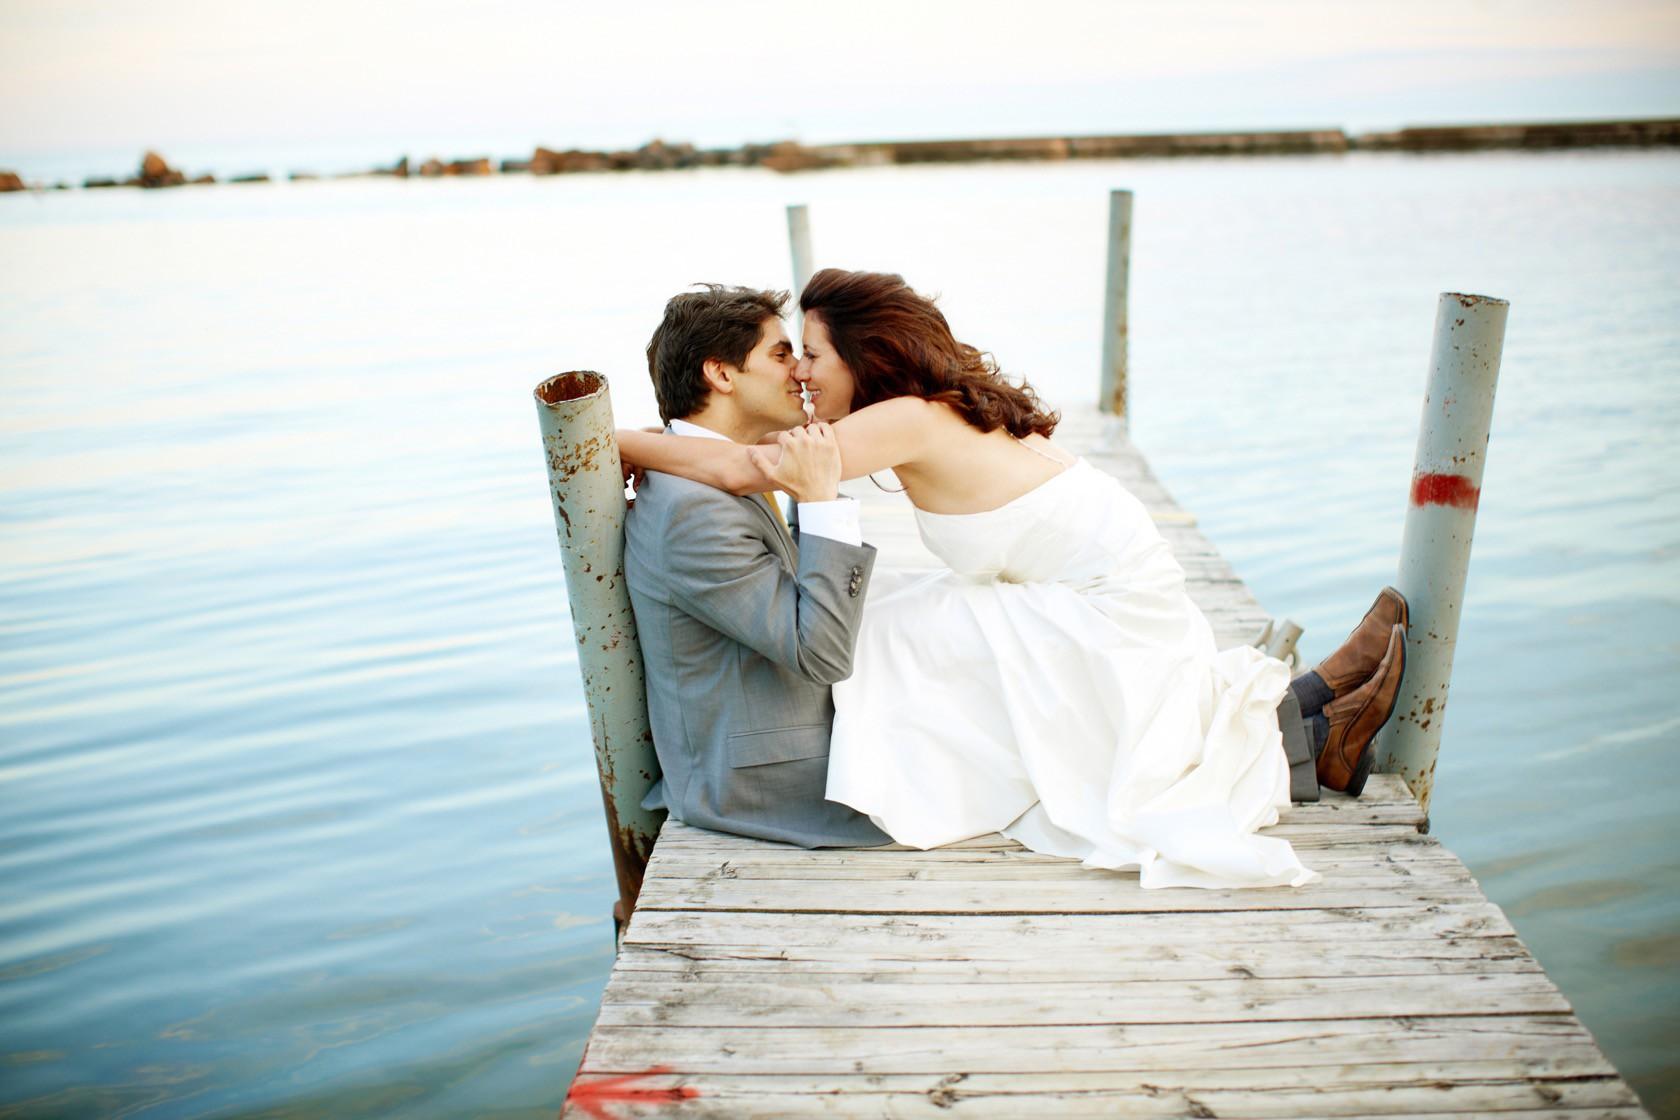 stephen sager photography 0001 fine art wedding photography